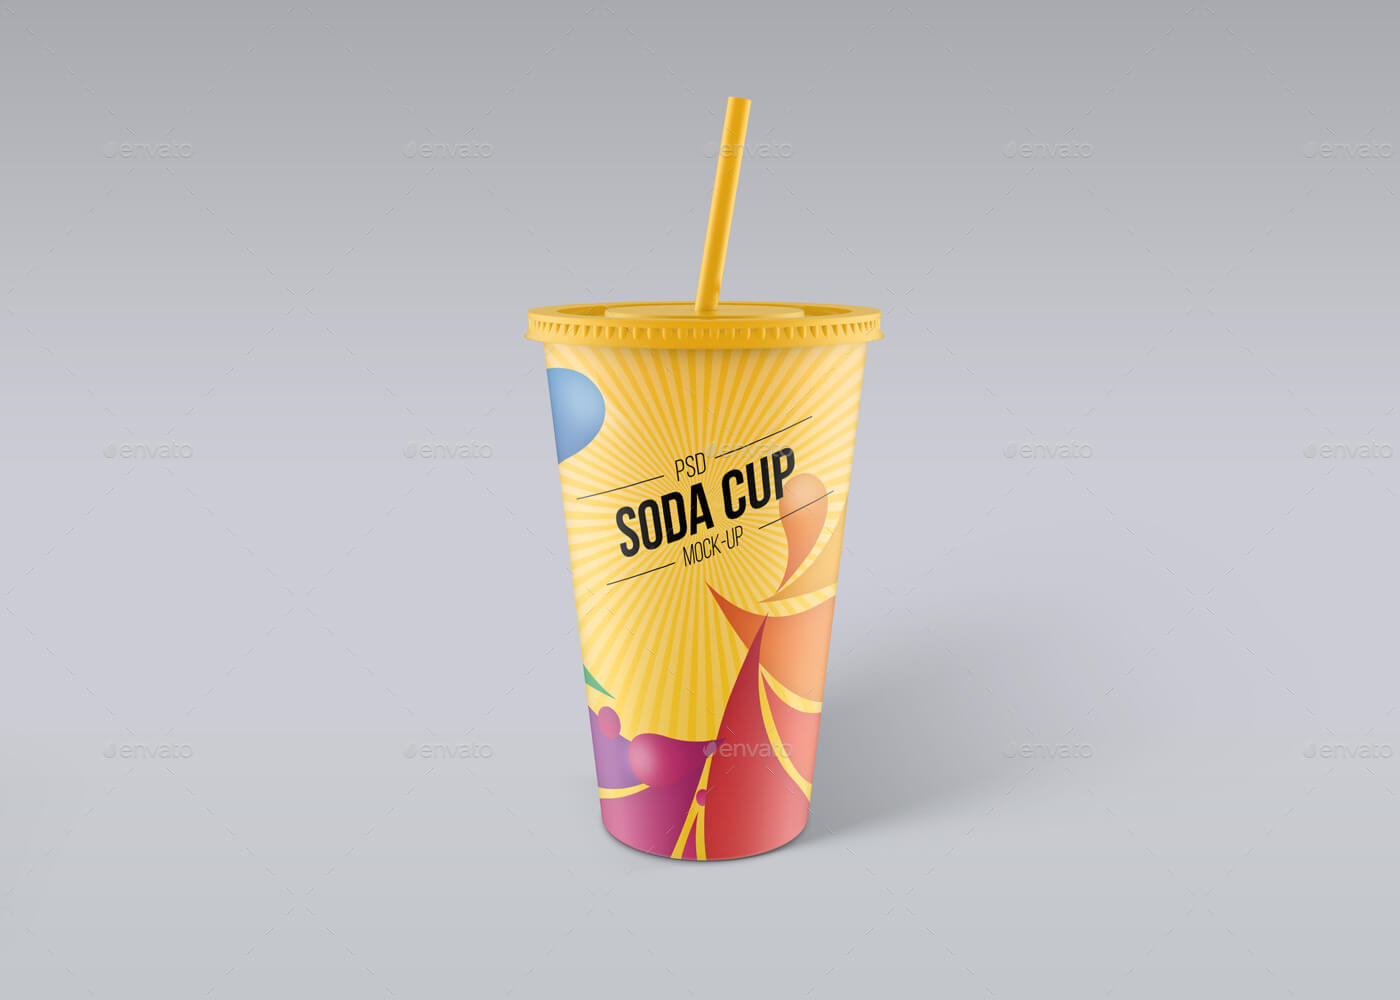 Soda Cup Mock-Up (1)